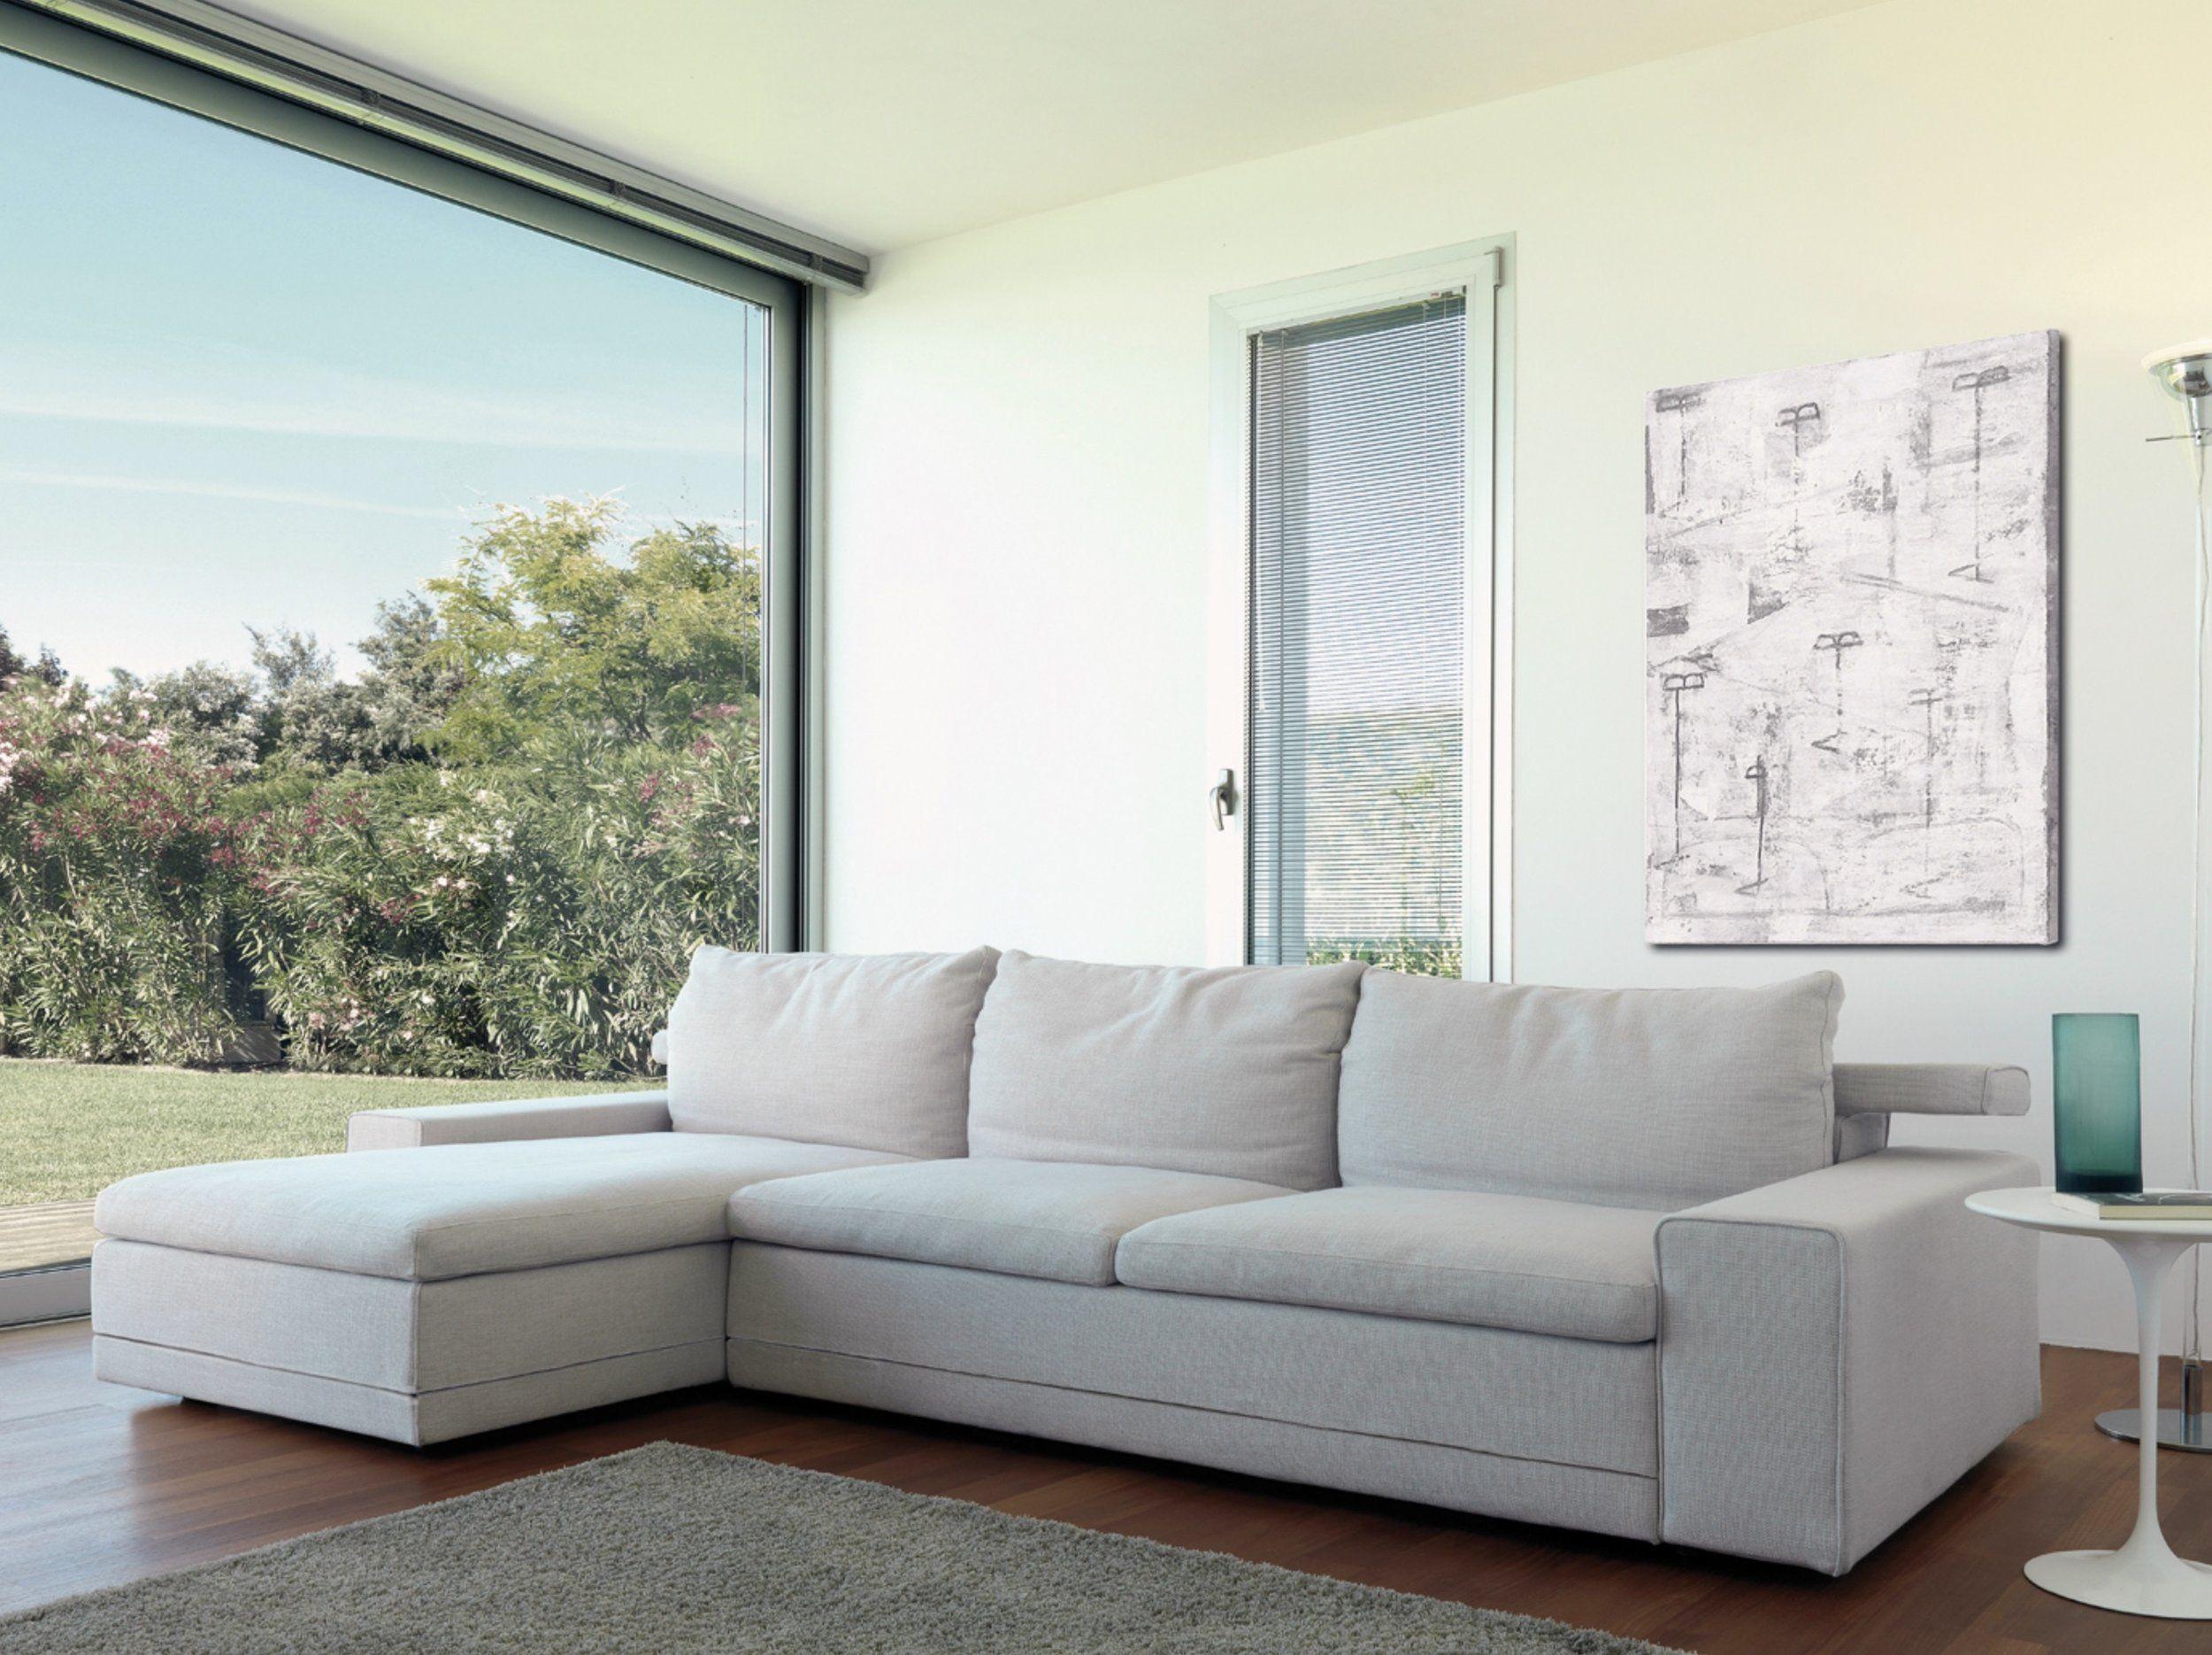 Sbd modern sofa beds interior inspiration in pinterest